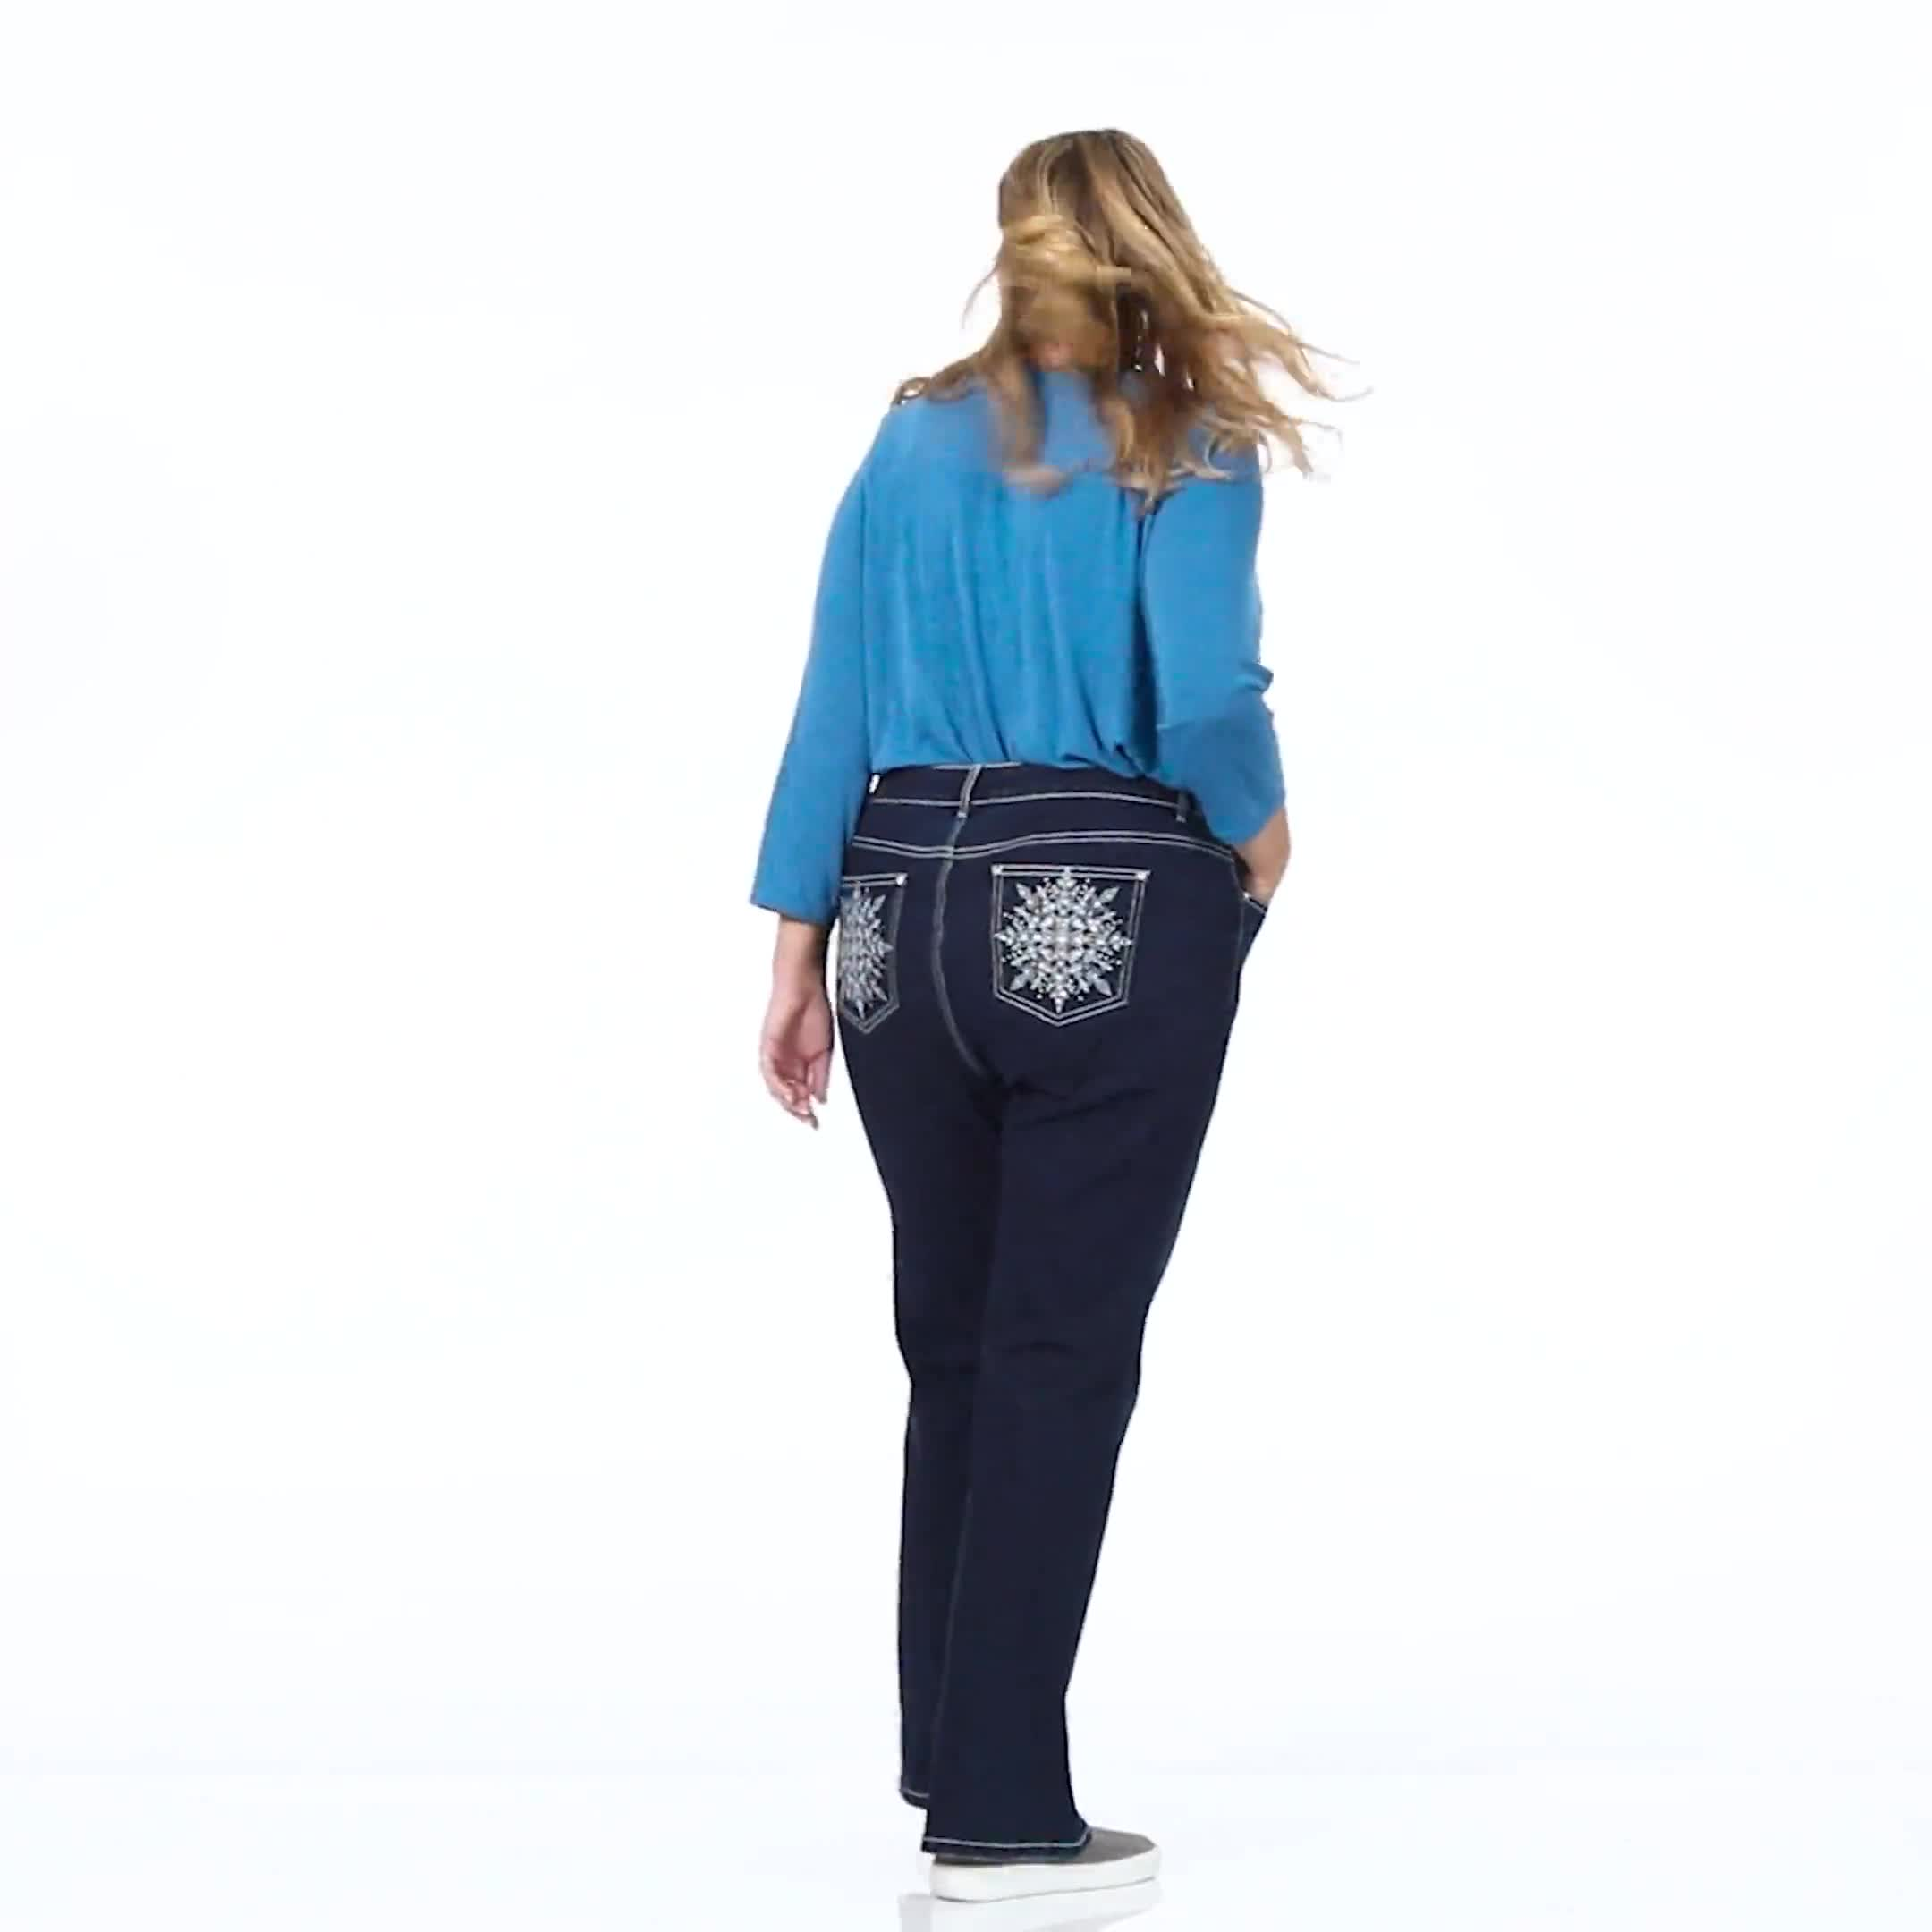 Plus Westport Signature Bootcut 5 Pocket Jean with Starburst Bling Back Pocket Detail - Plus - Video